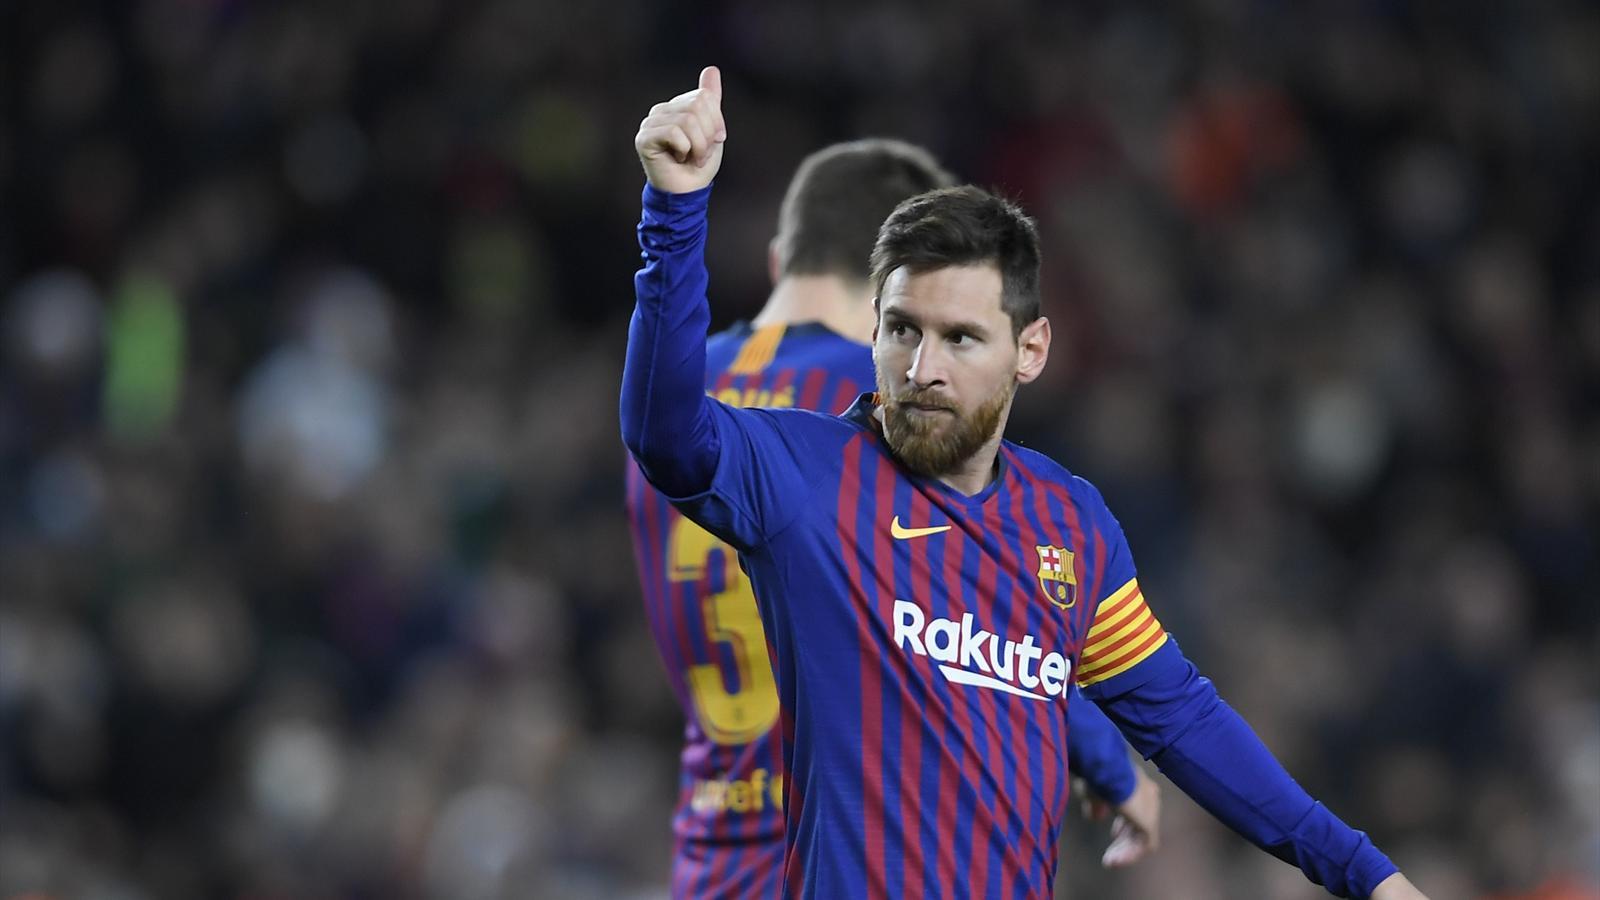 Le Barça retrouve la victoire contre le Real Valladolid